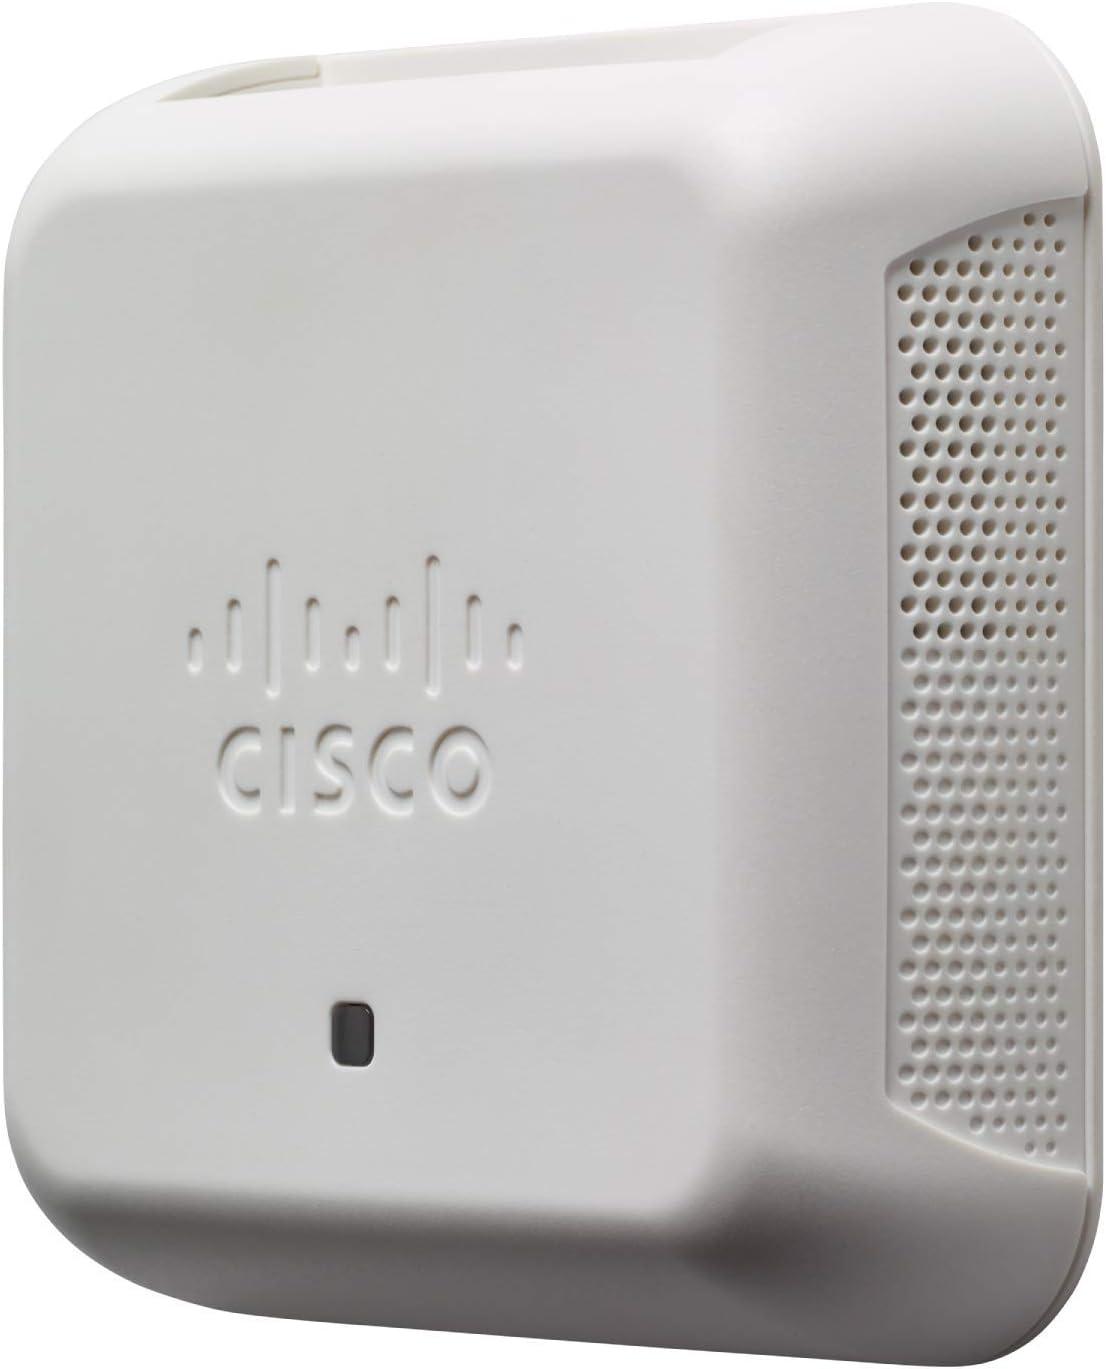 Cisco WAP150 Wireless AC/N Dual Radio Access Point, Limited Lifetime Protection (WAP150-A-K9-NA)